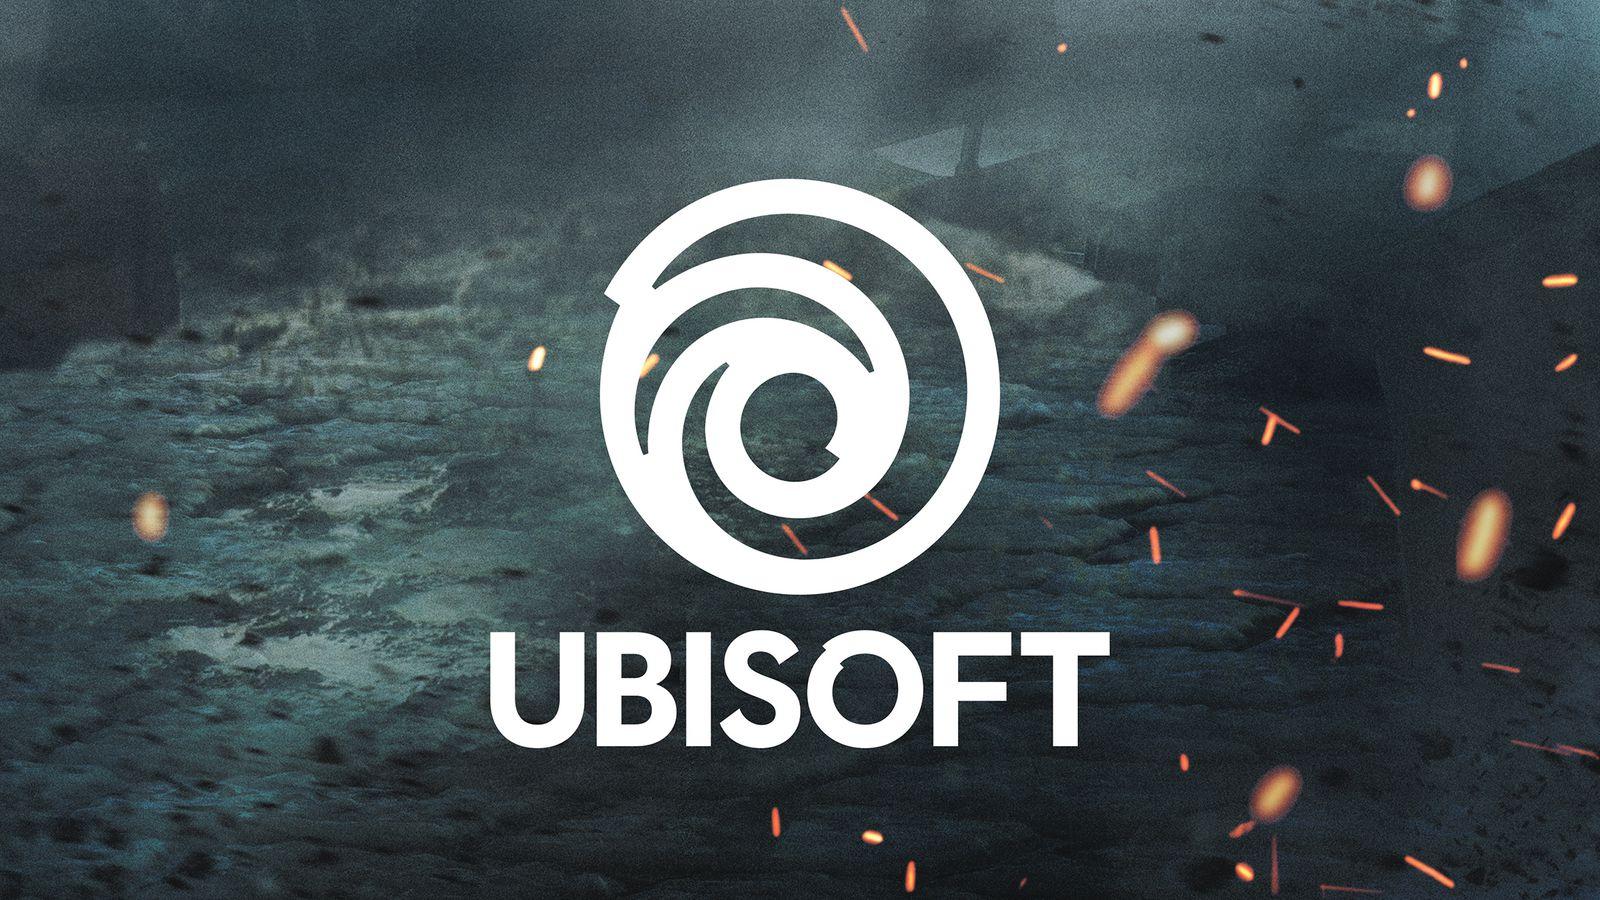 Ubisoft now auto-bans Rainbow Six Siege players who use toxic